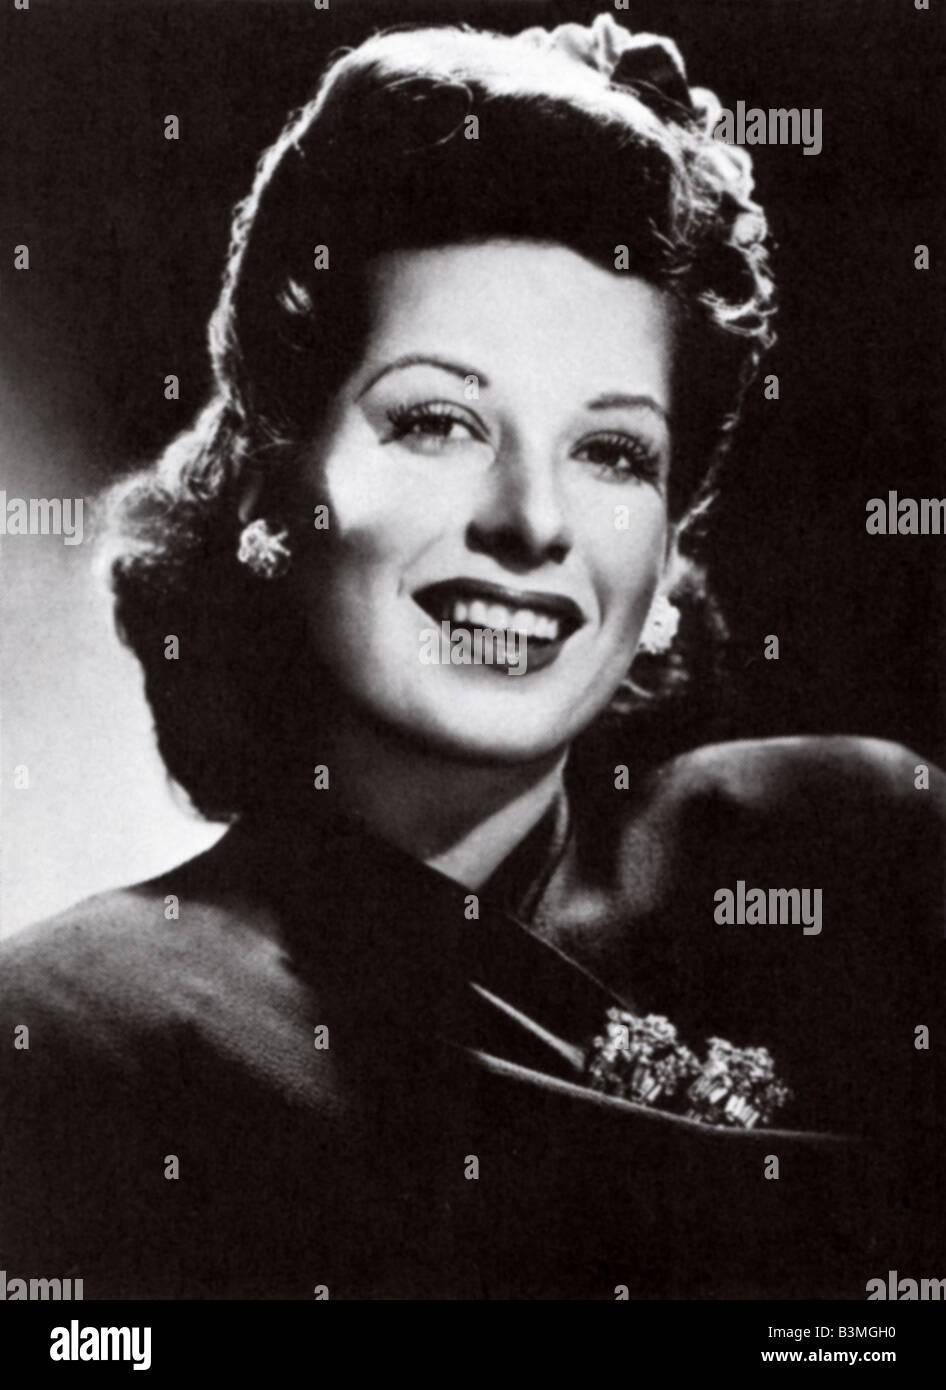 HELEN FORREST US jazz singer 1917 to 1999 - Stock Image